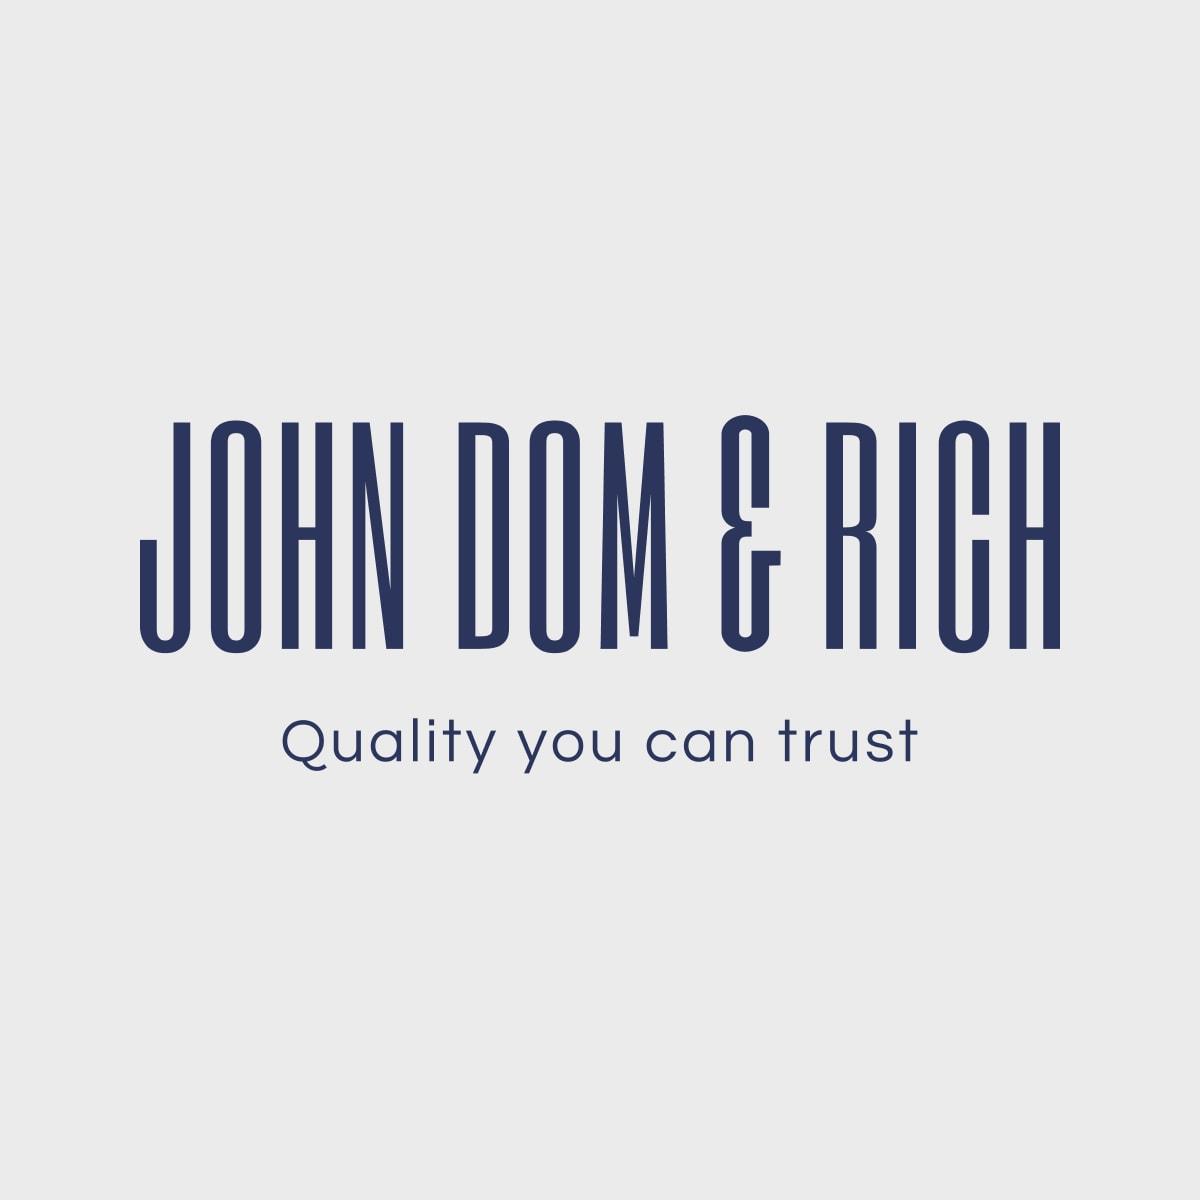 John Dom & Rich